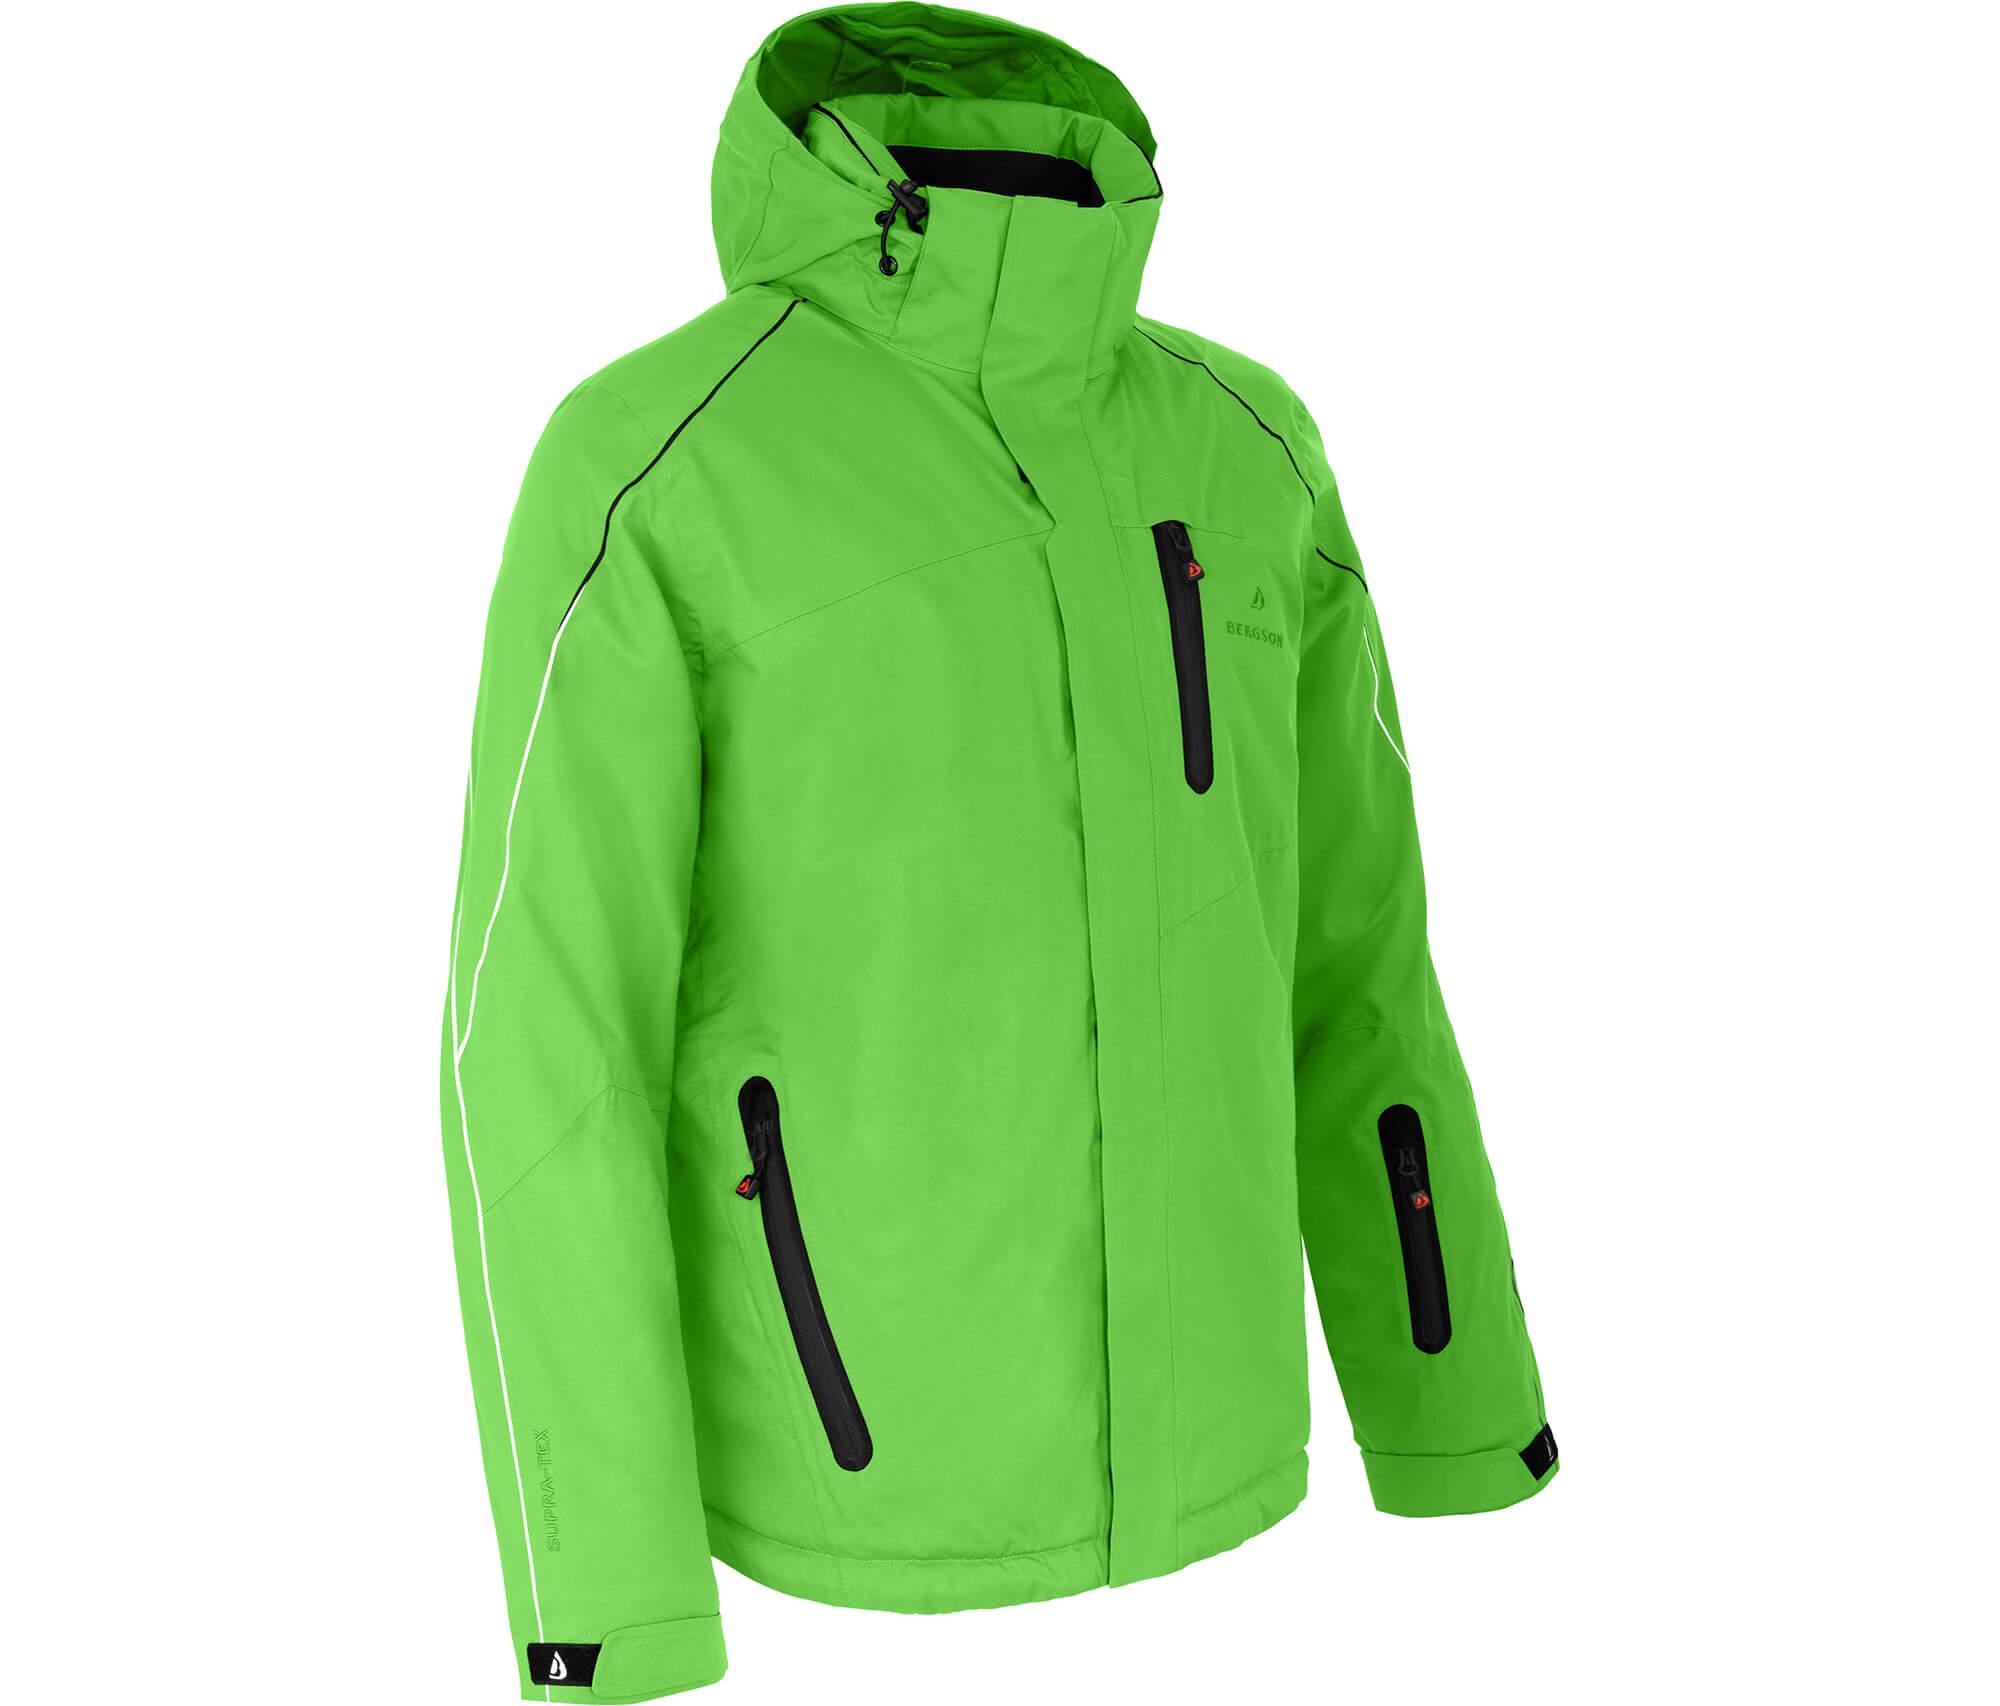 Bergson Herren Skijacke NOVA flash grün